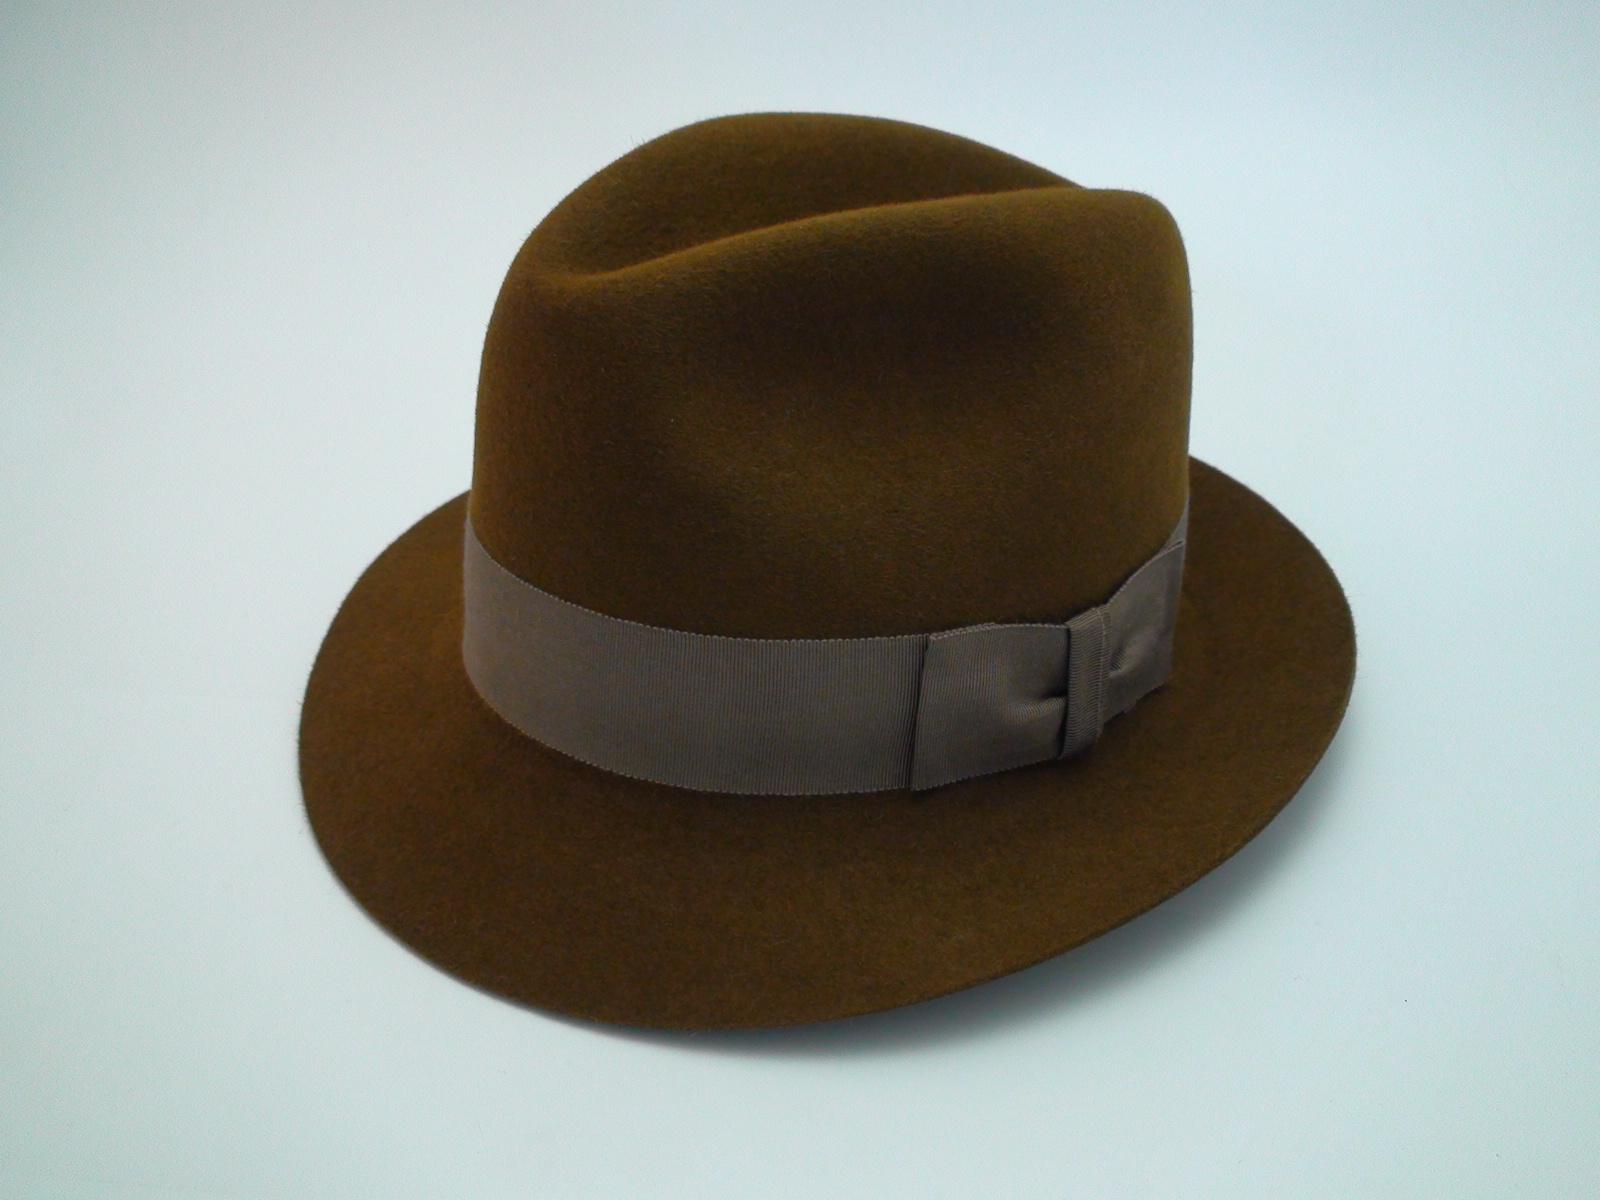 92738d8c6 Smithbilt Hats Knight Chocolate Brown Fur Felt Fedora Hat